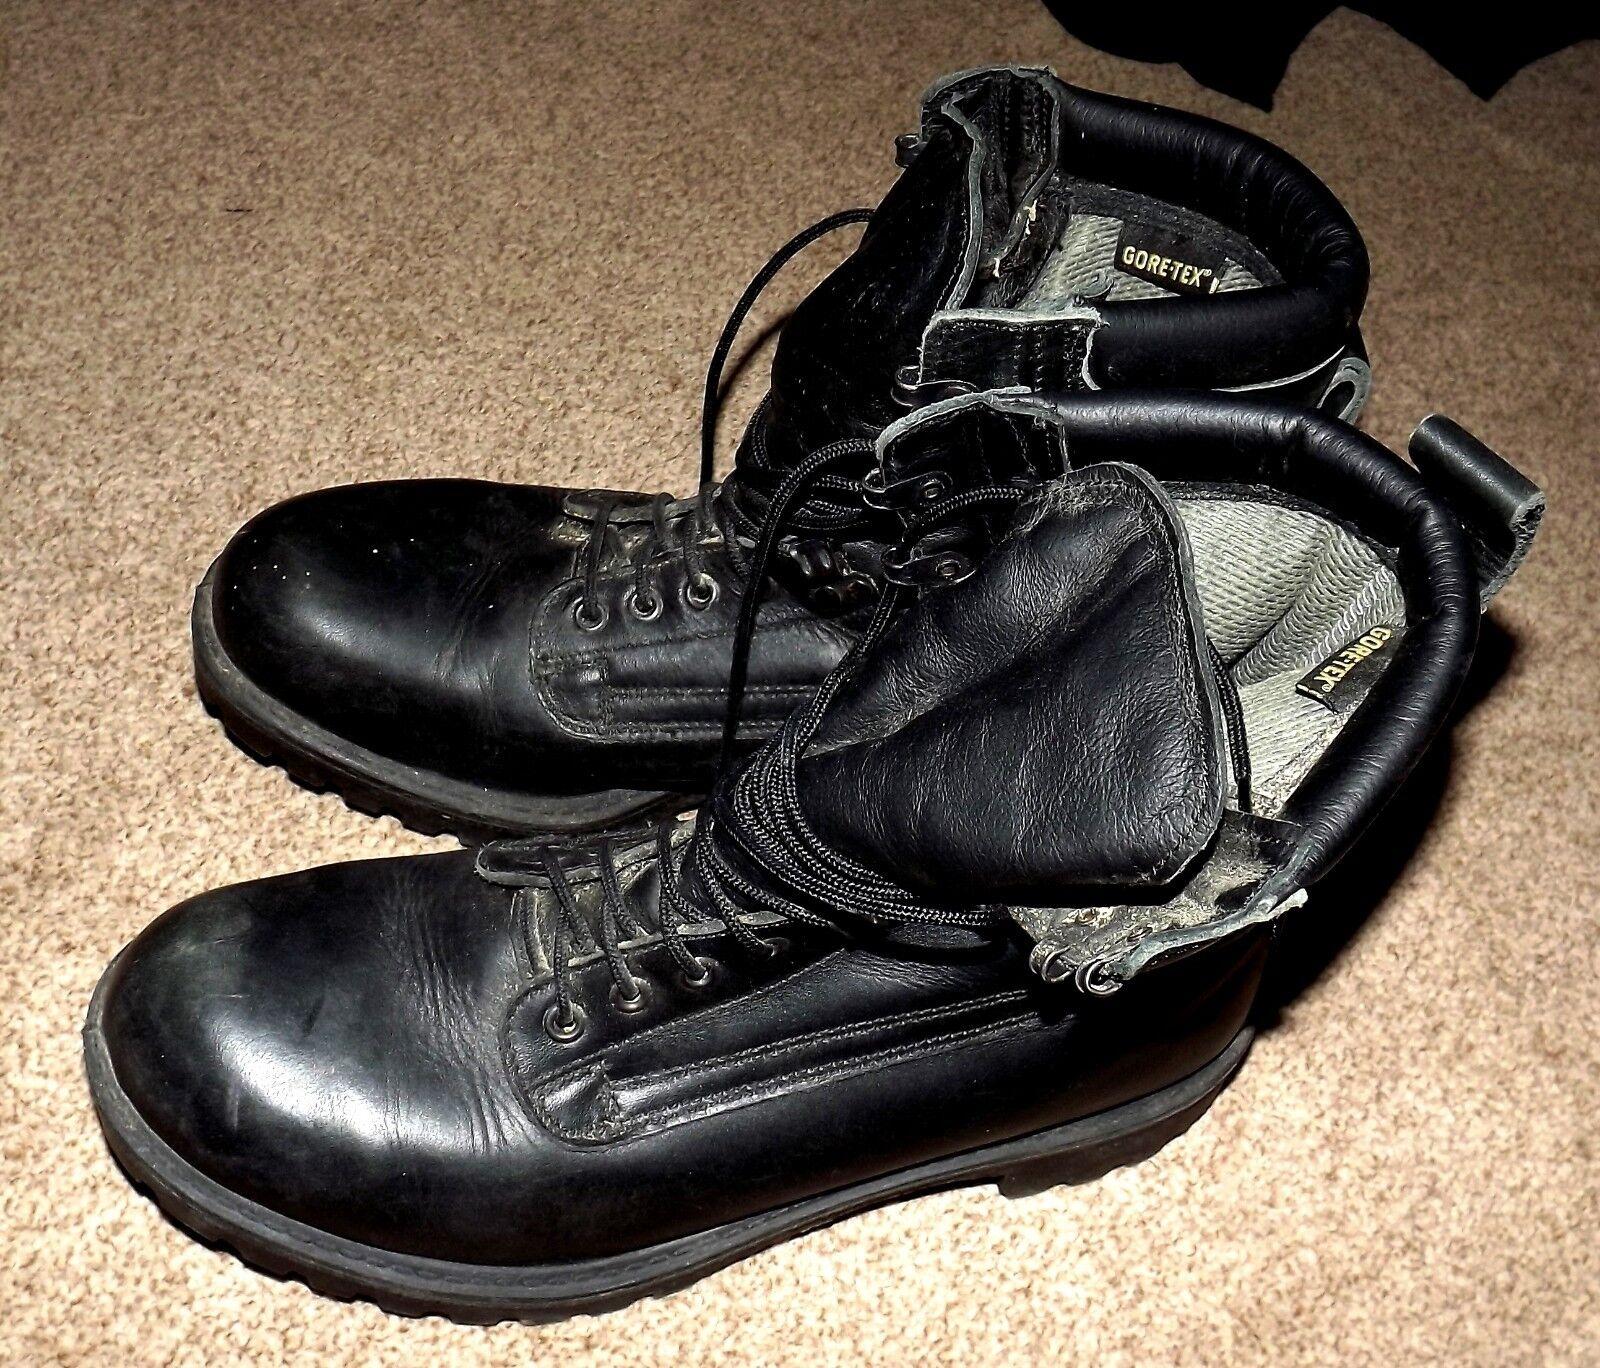 Herren HEAVY DUTY UK 10 BLACK LEATHER GORTEX LACE UP Stiefel STEEL TOE CAPS MILITARY